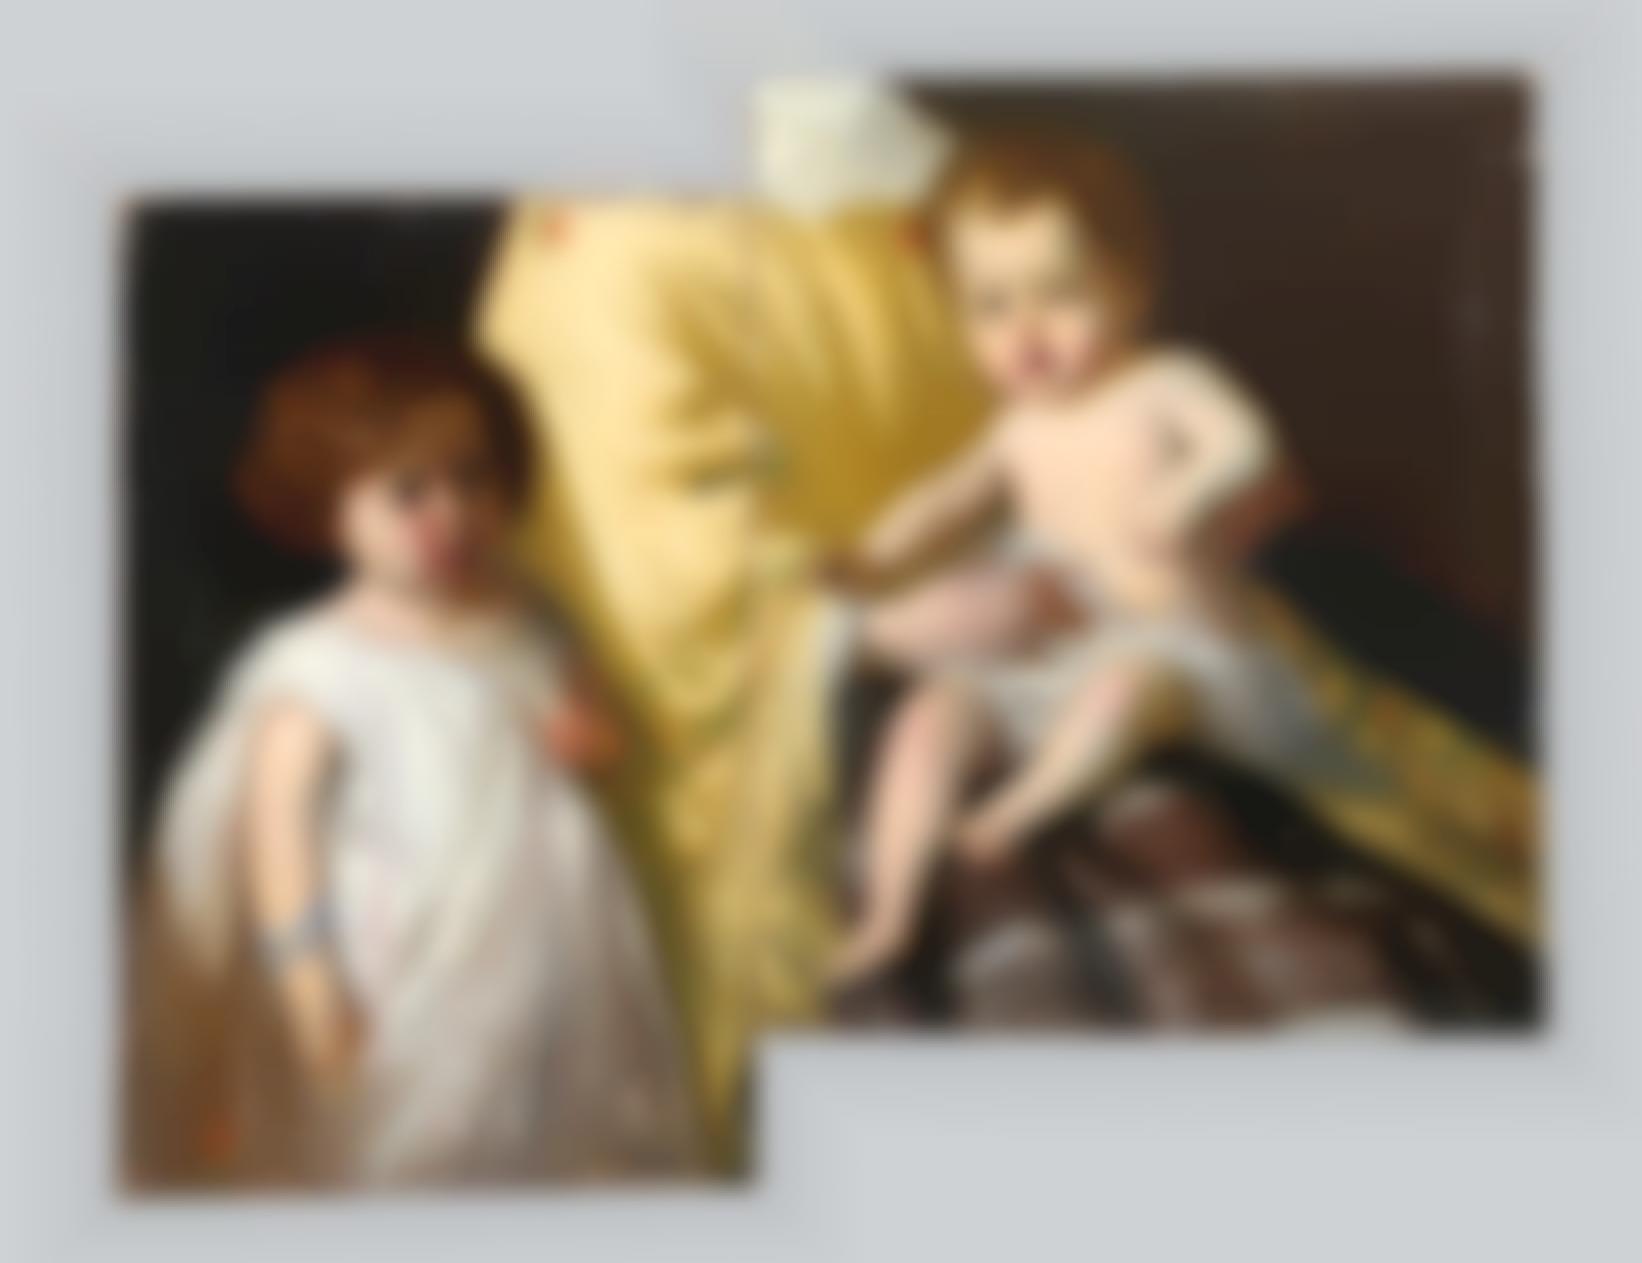 Esquivel Y Suarez De Urbina, Antonio Maria - Couple of children's portraits-1841